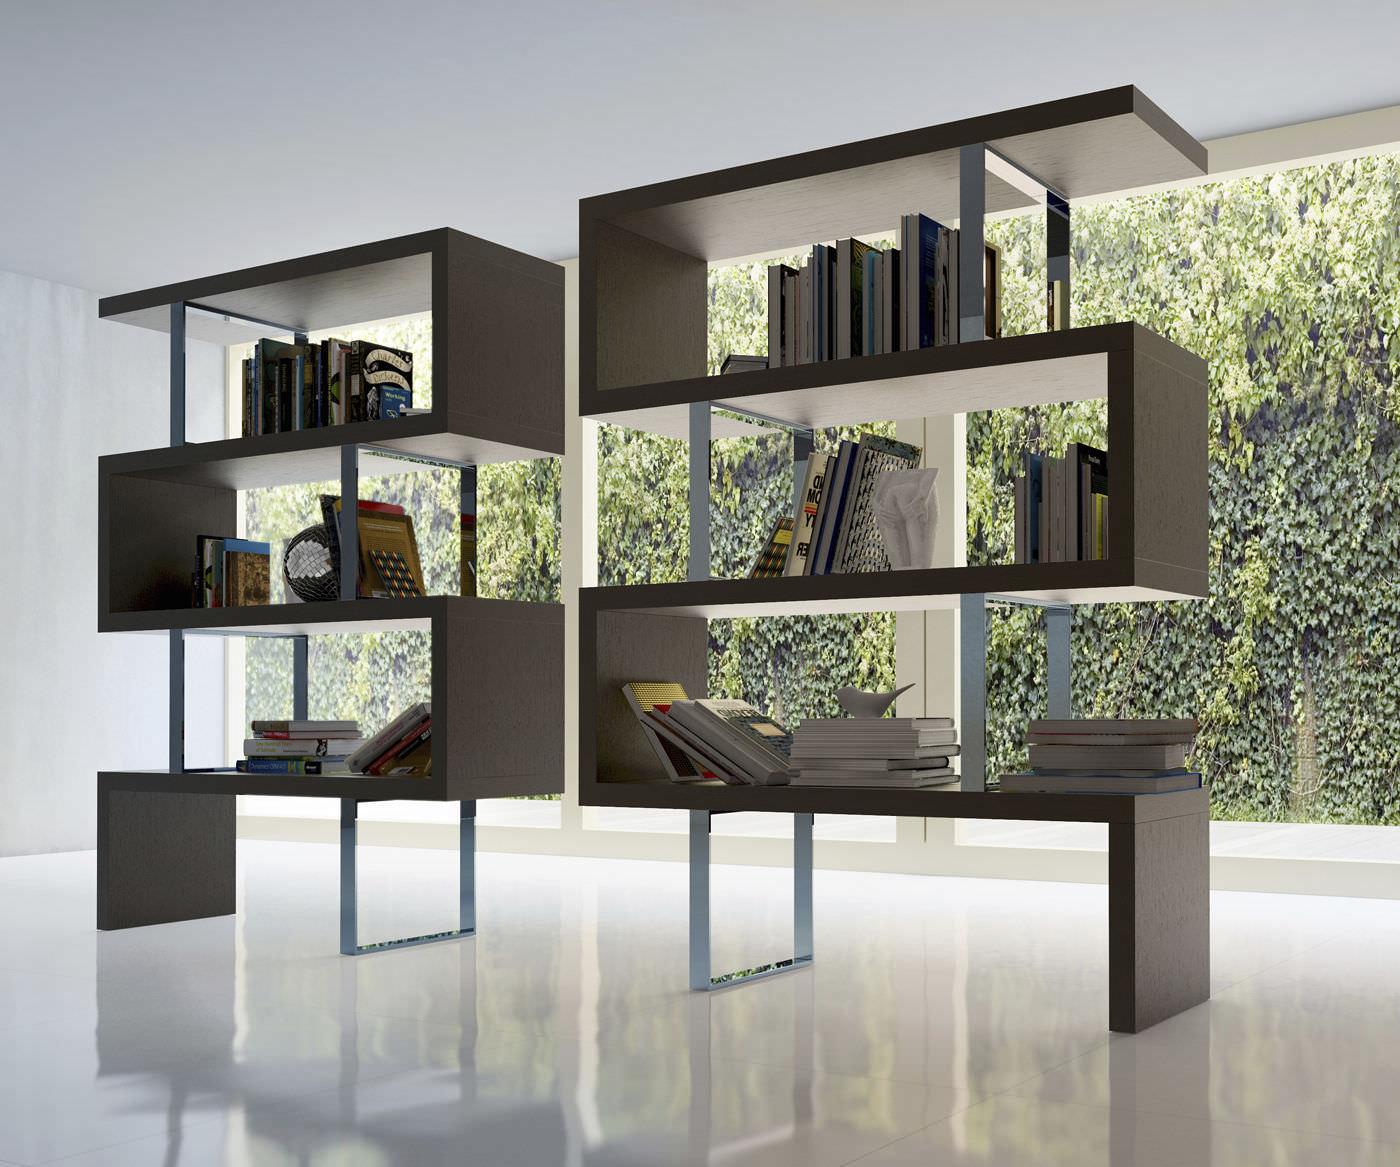 Libreria Moderna In Legno.Libreria Moderna In Legno Pearl Modloft